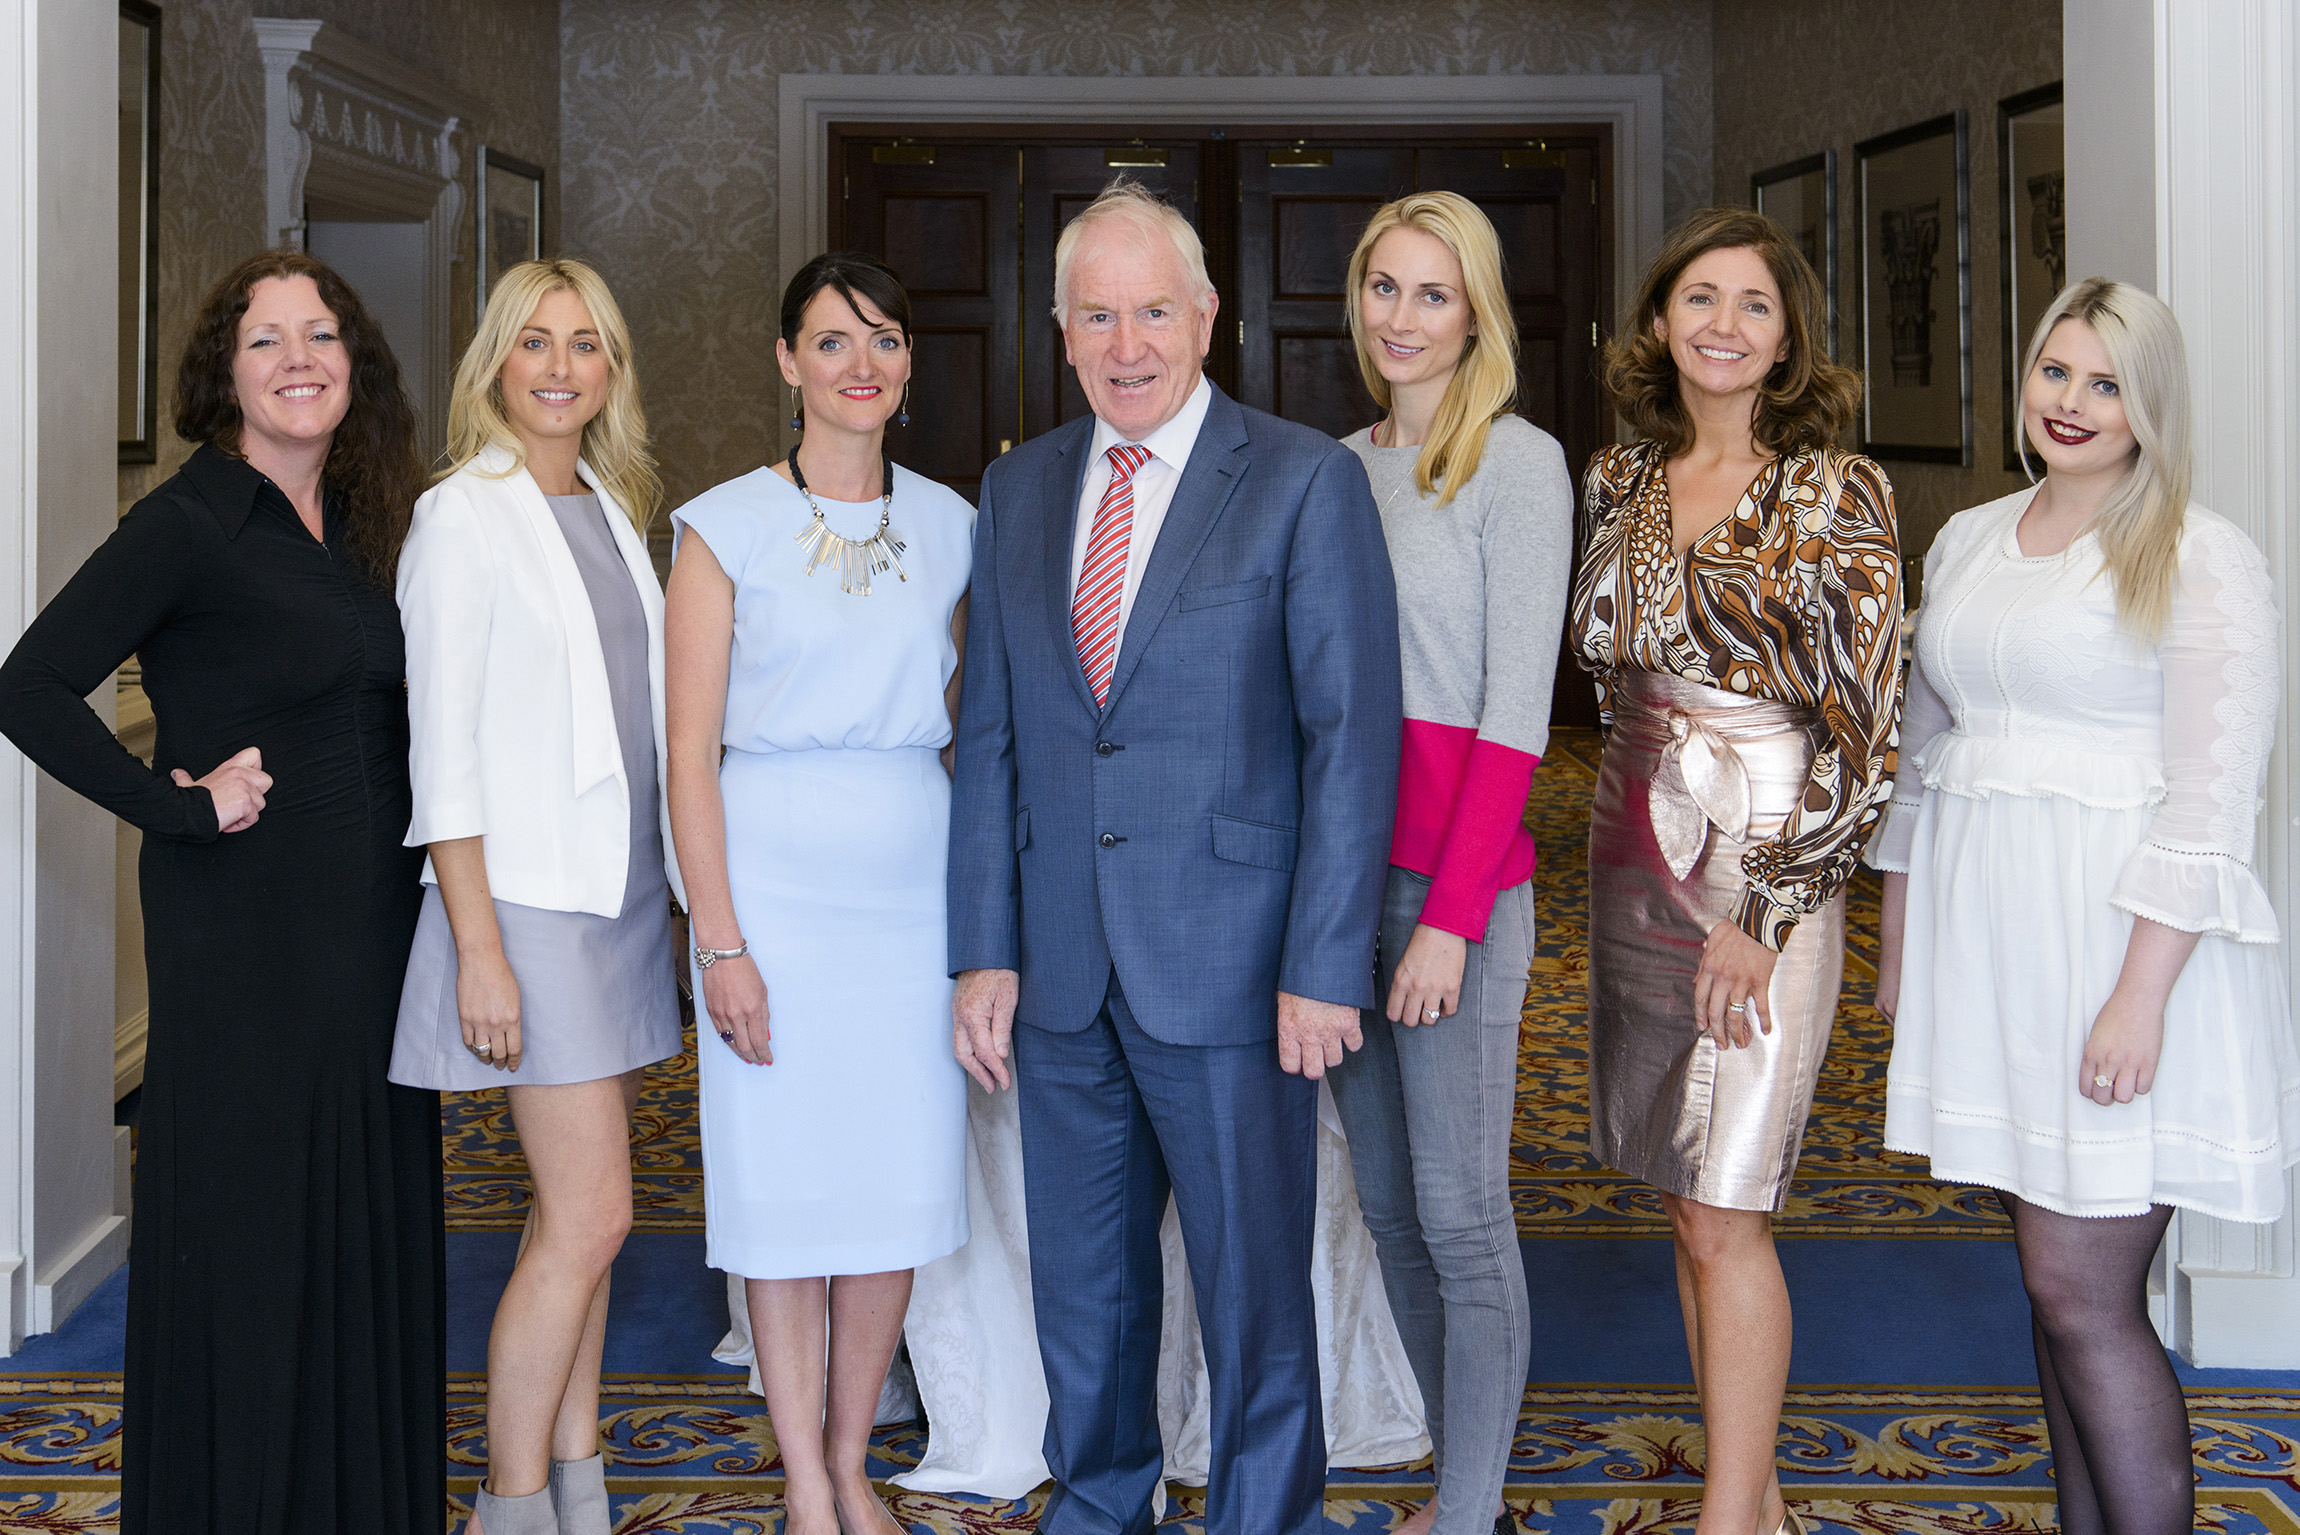 Jennifer Rothwell, Caroline Matthews, Fiona Heaney, Minister Jimmy Deenihan, Lucy Nagle. Caroline Kennelly and Dot :}